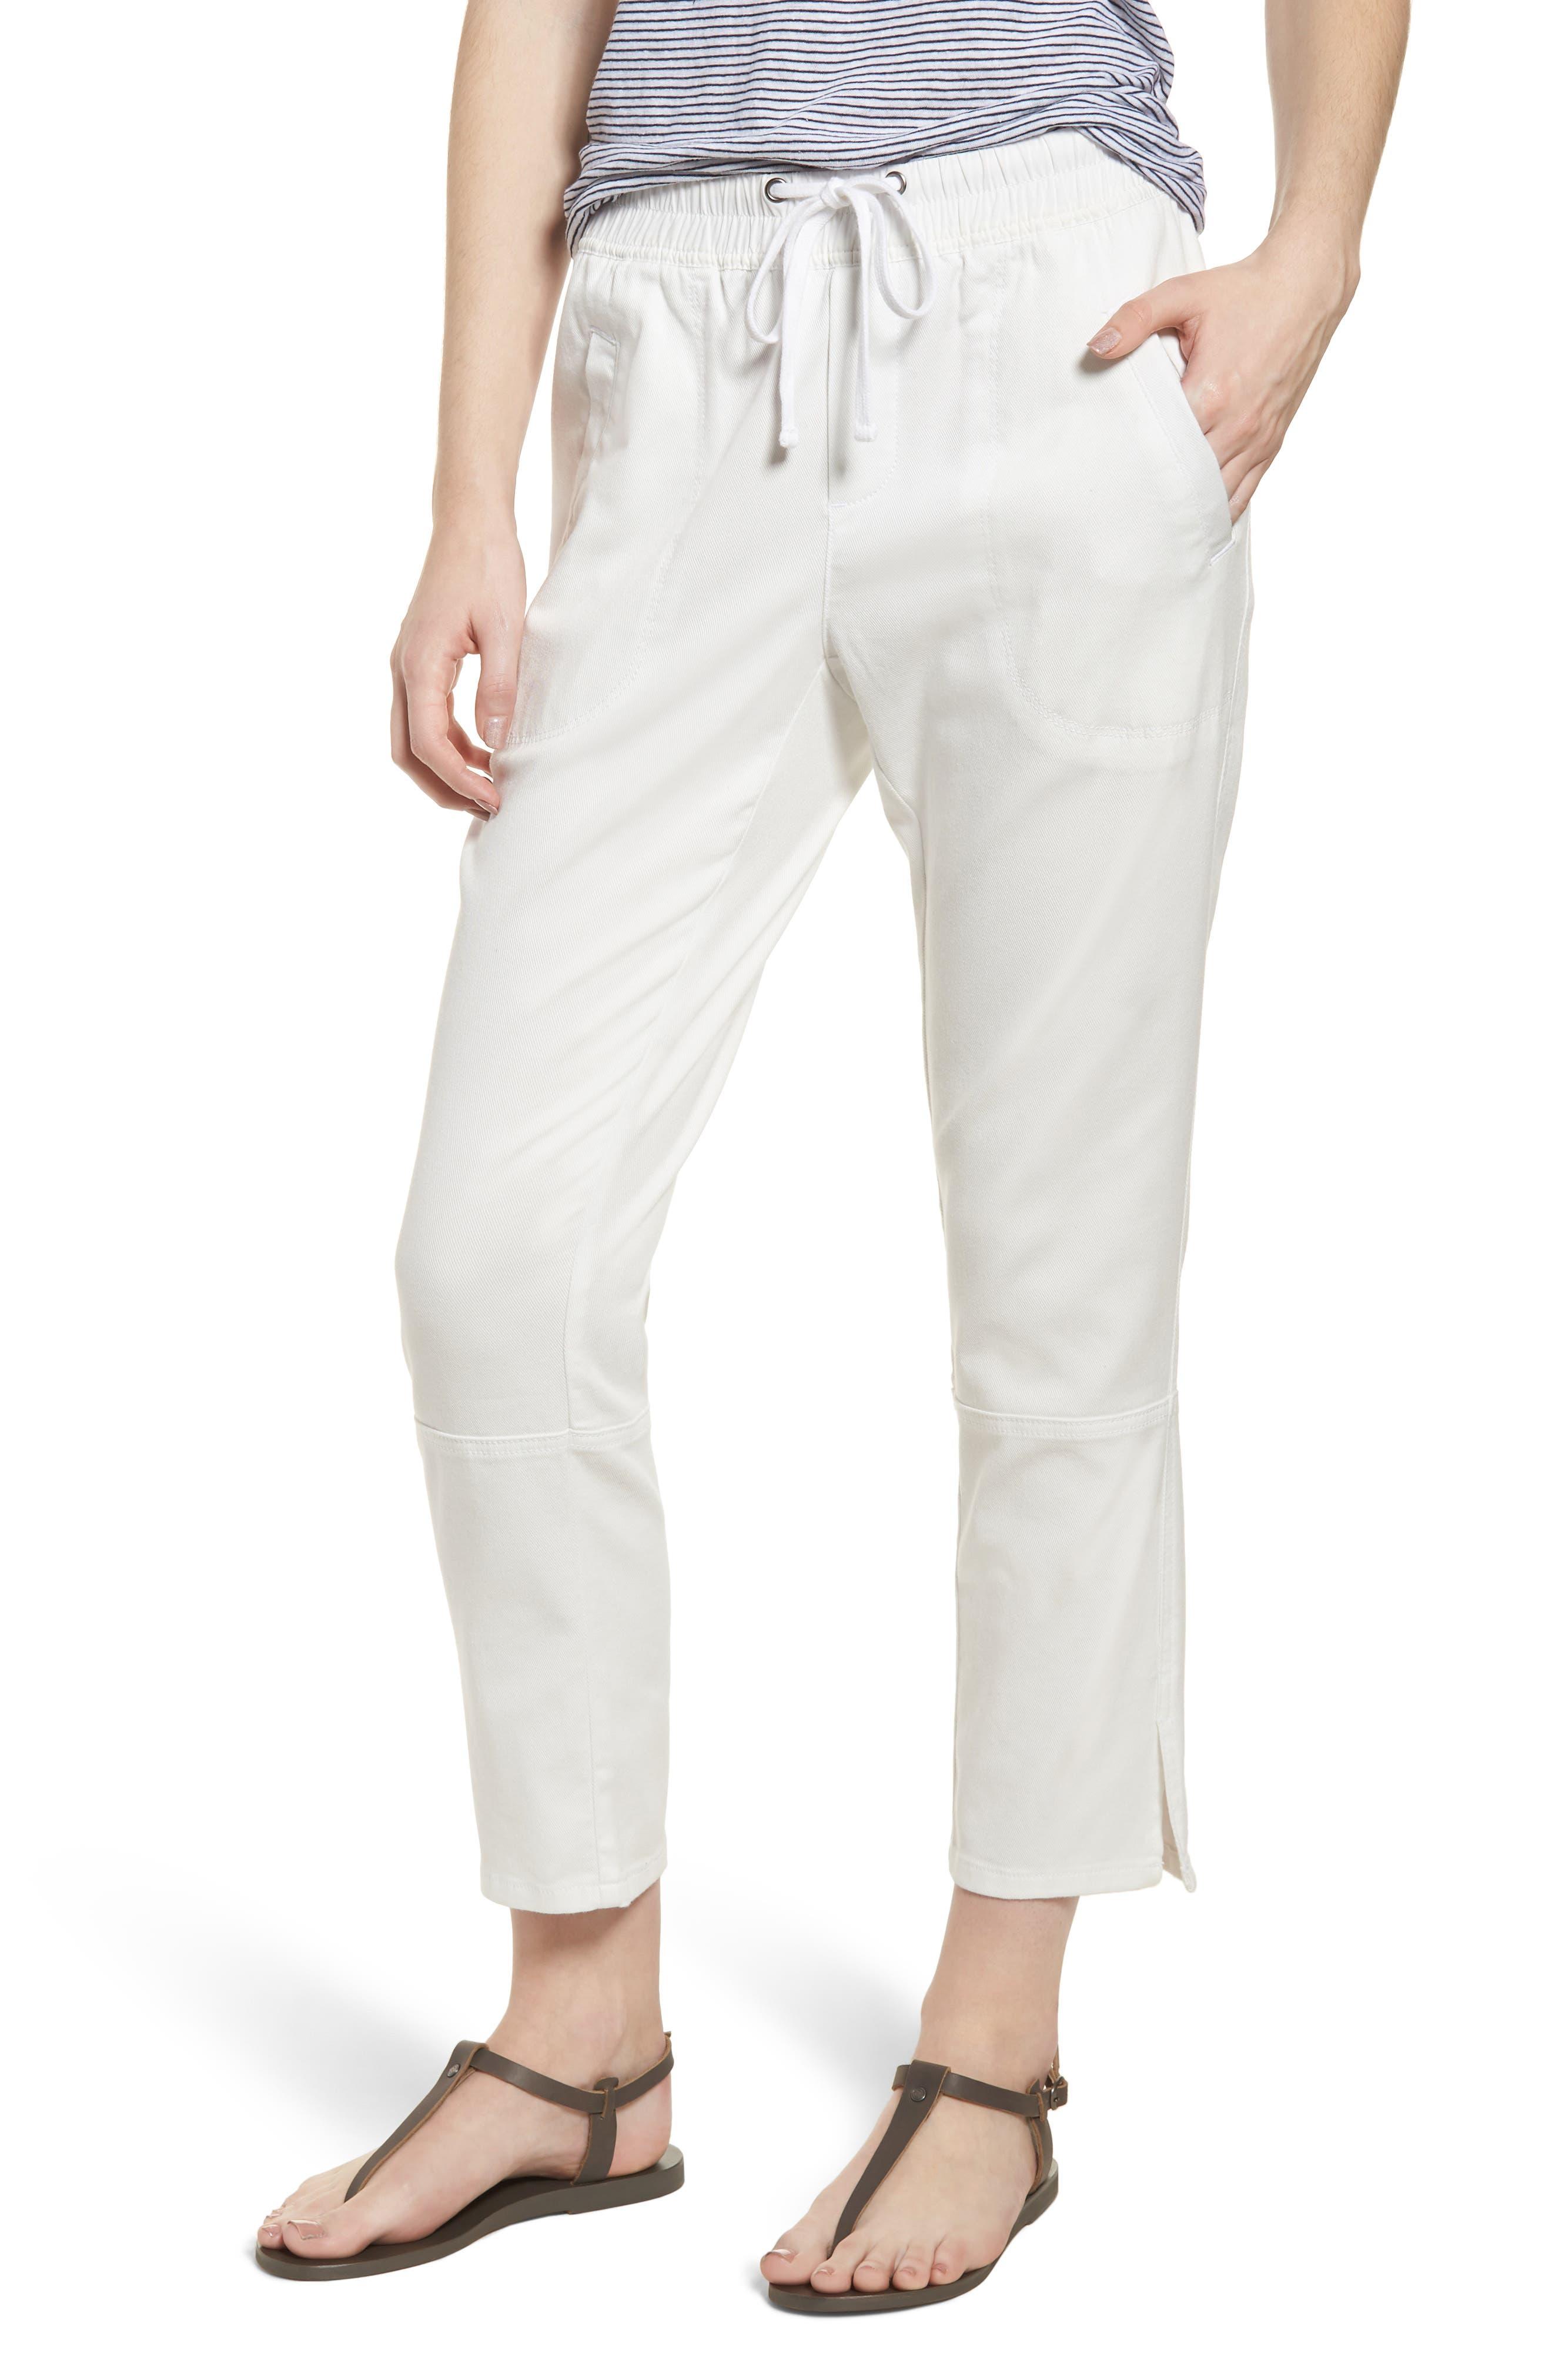 Open Road Ankle Pants,                         Main,                         color, 123